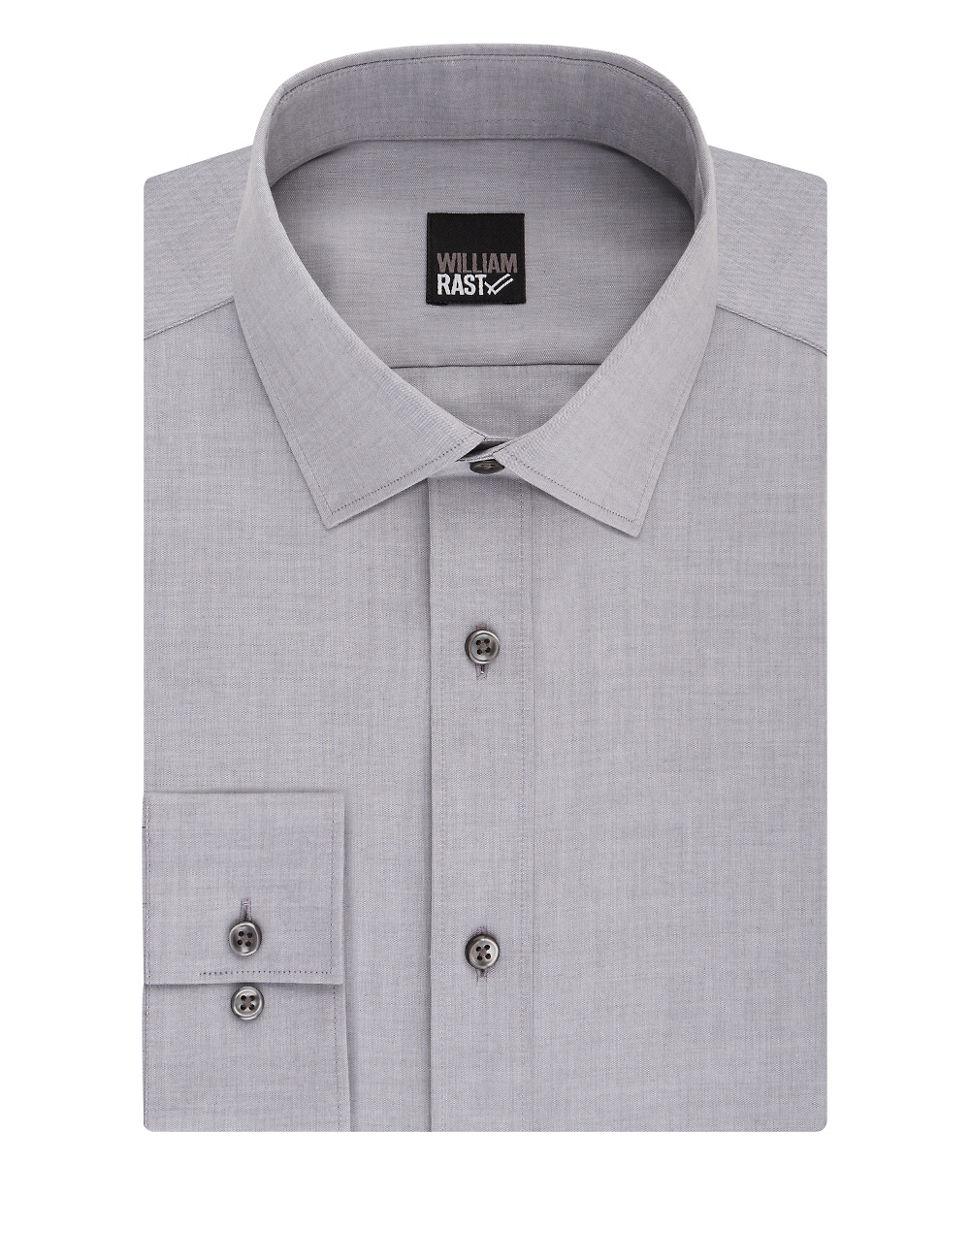 William Rast Slim Fit Dress Shirt In Gray For Men Lyst